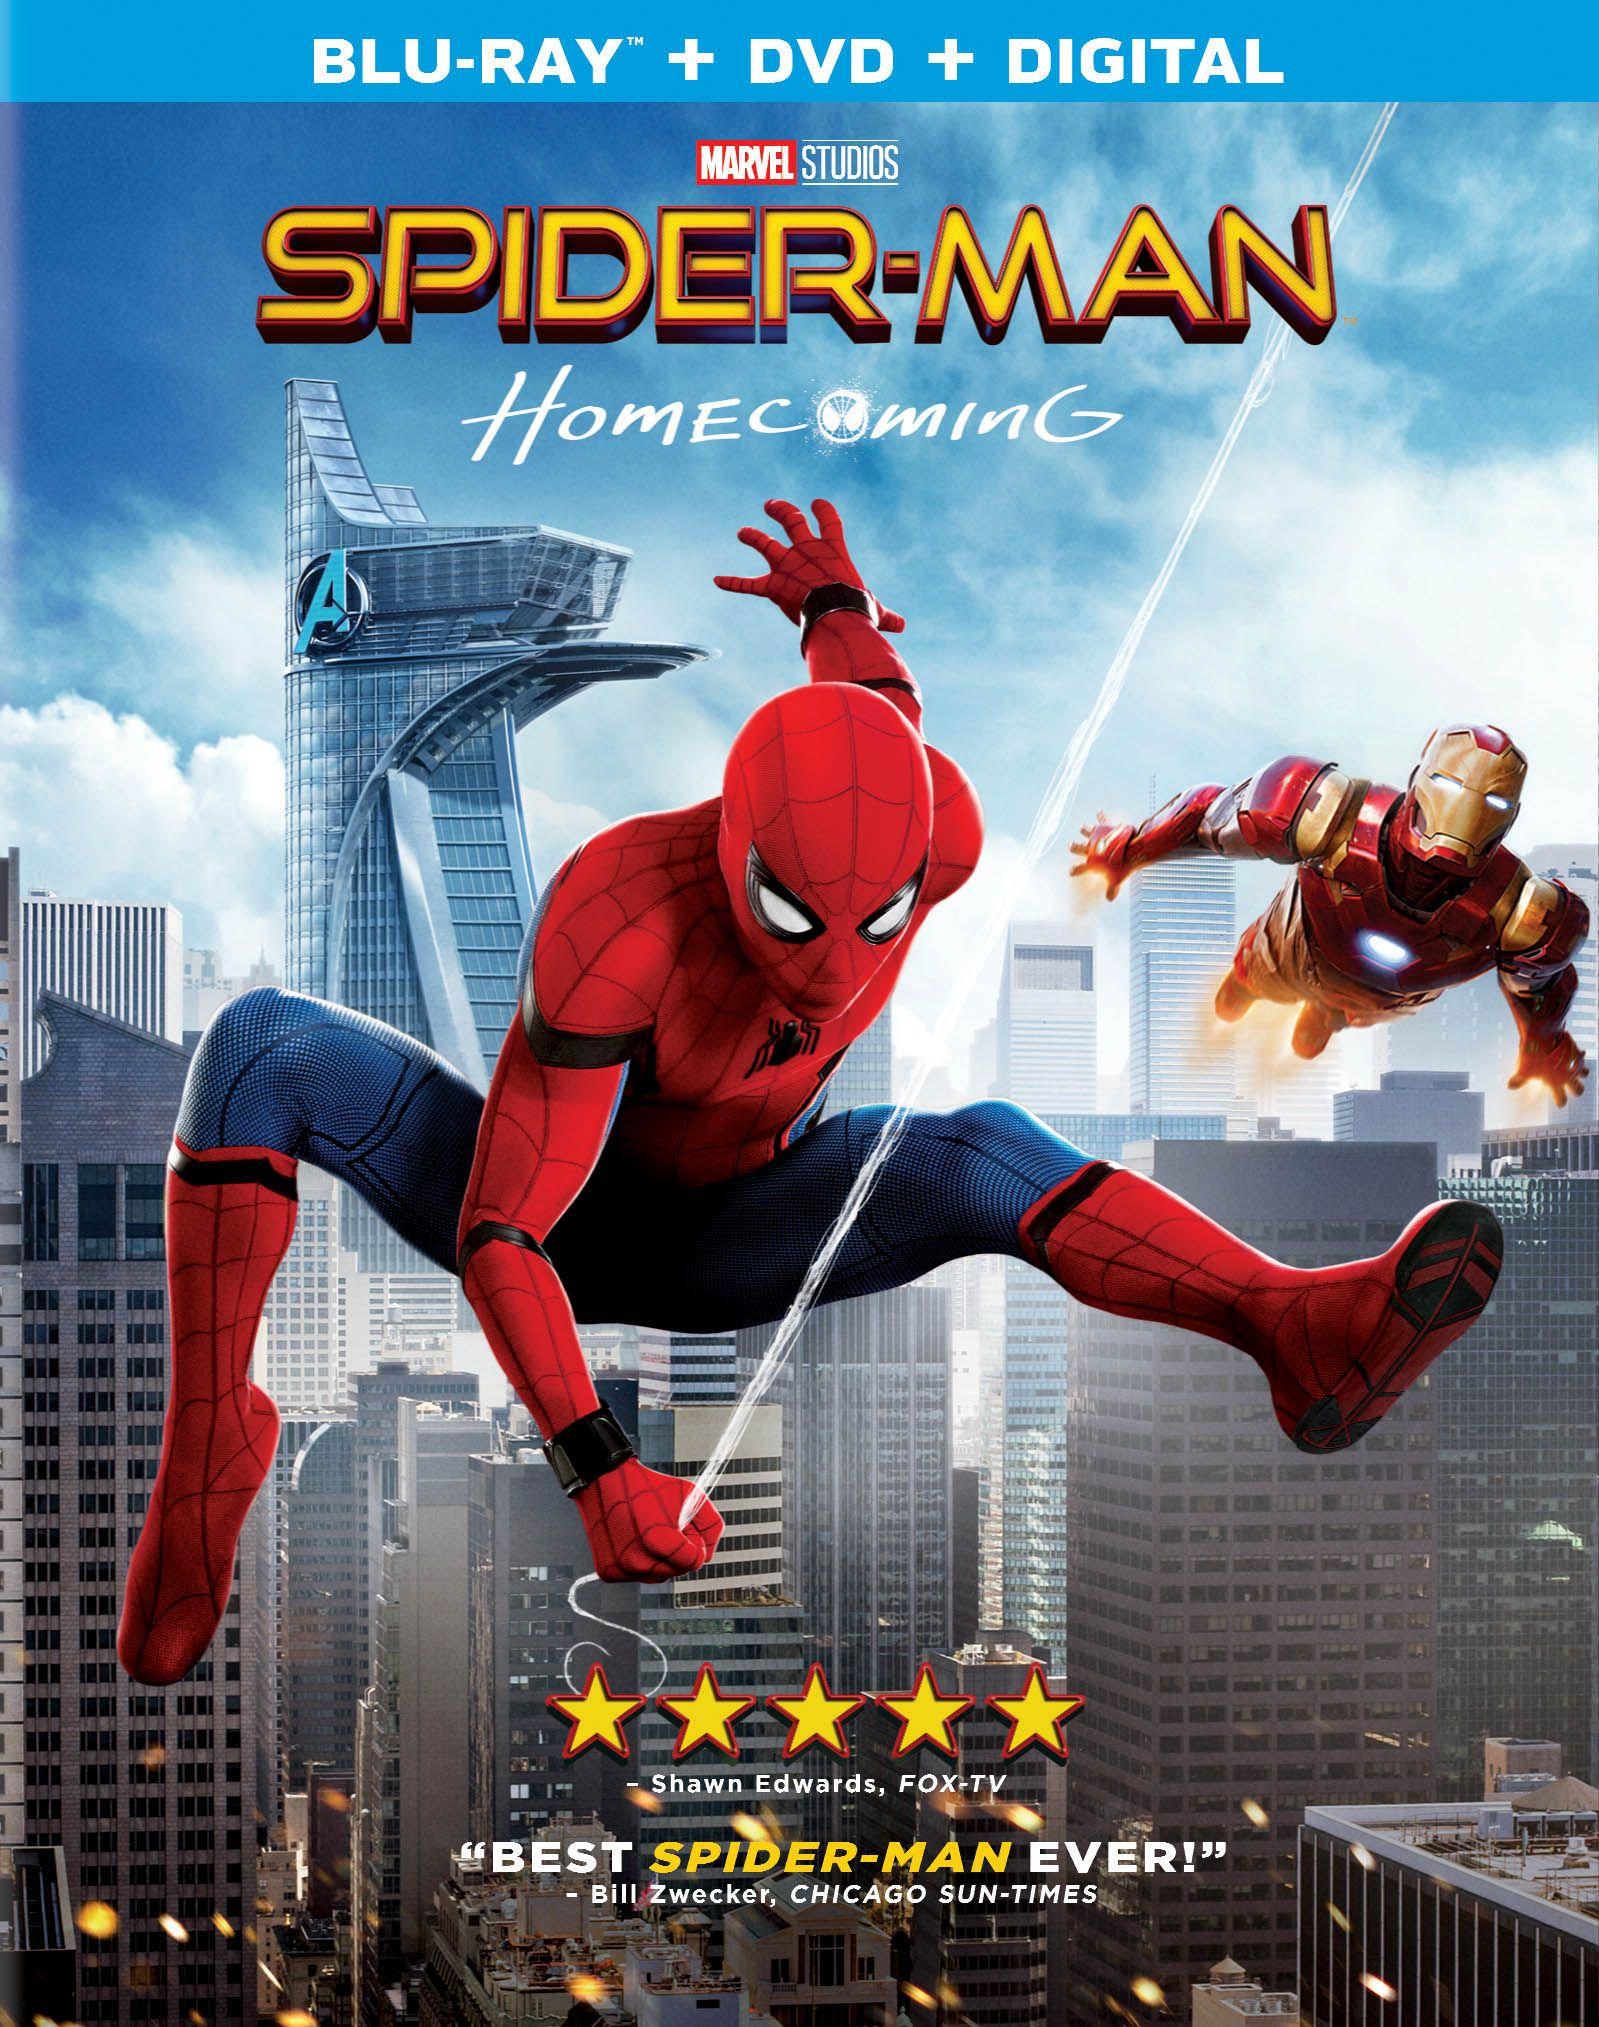 SpidermanHomecoming_2017_BD_ORING_FrontFlat1-1504626518